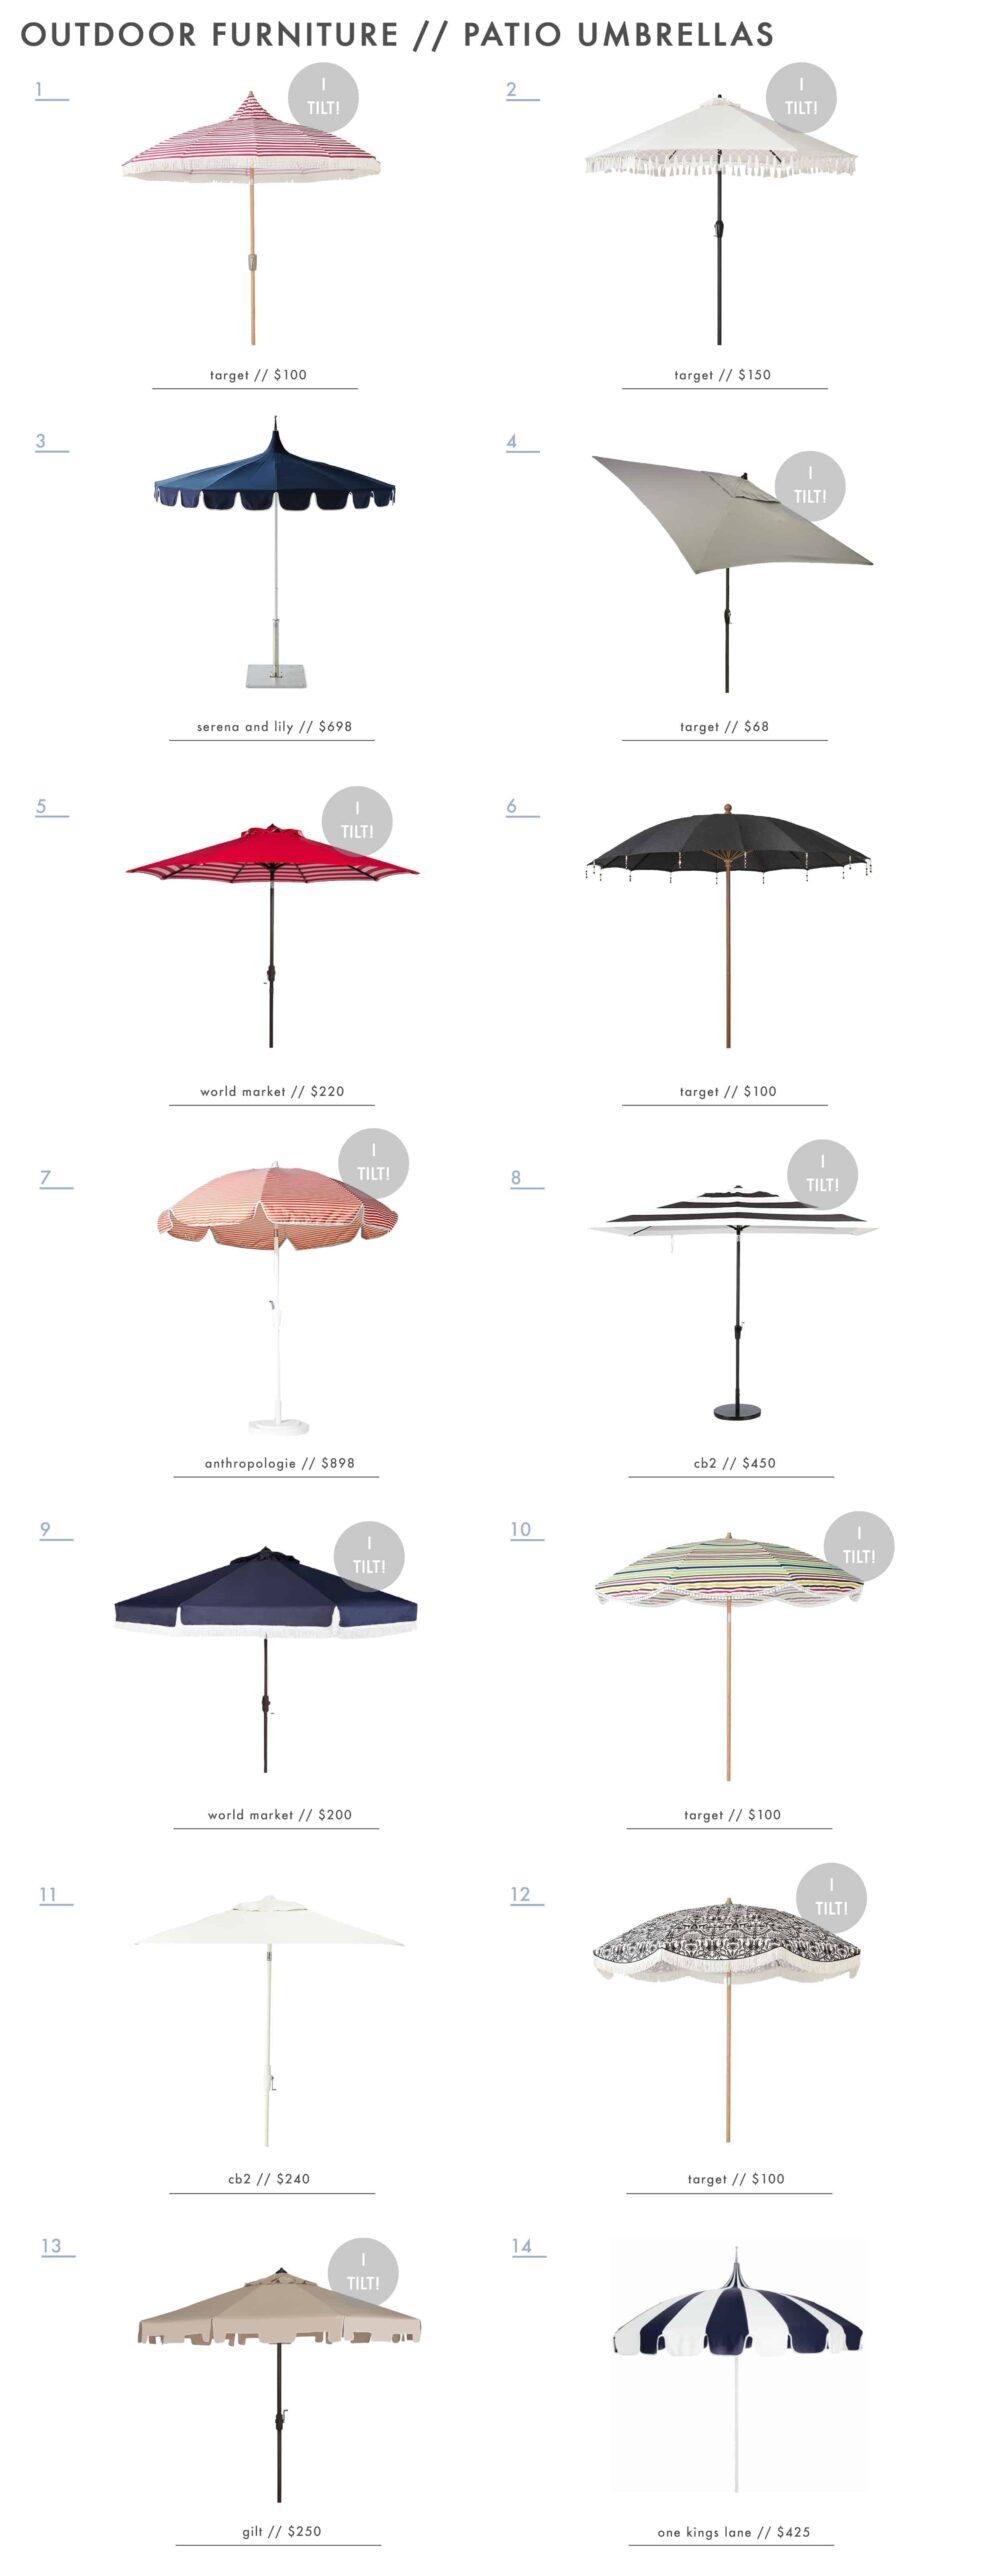 Emily Henderson Outdoor Furniture Dining Patio Umbrellas Roundup